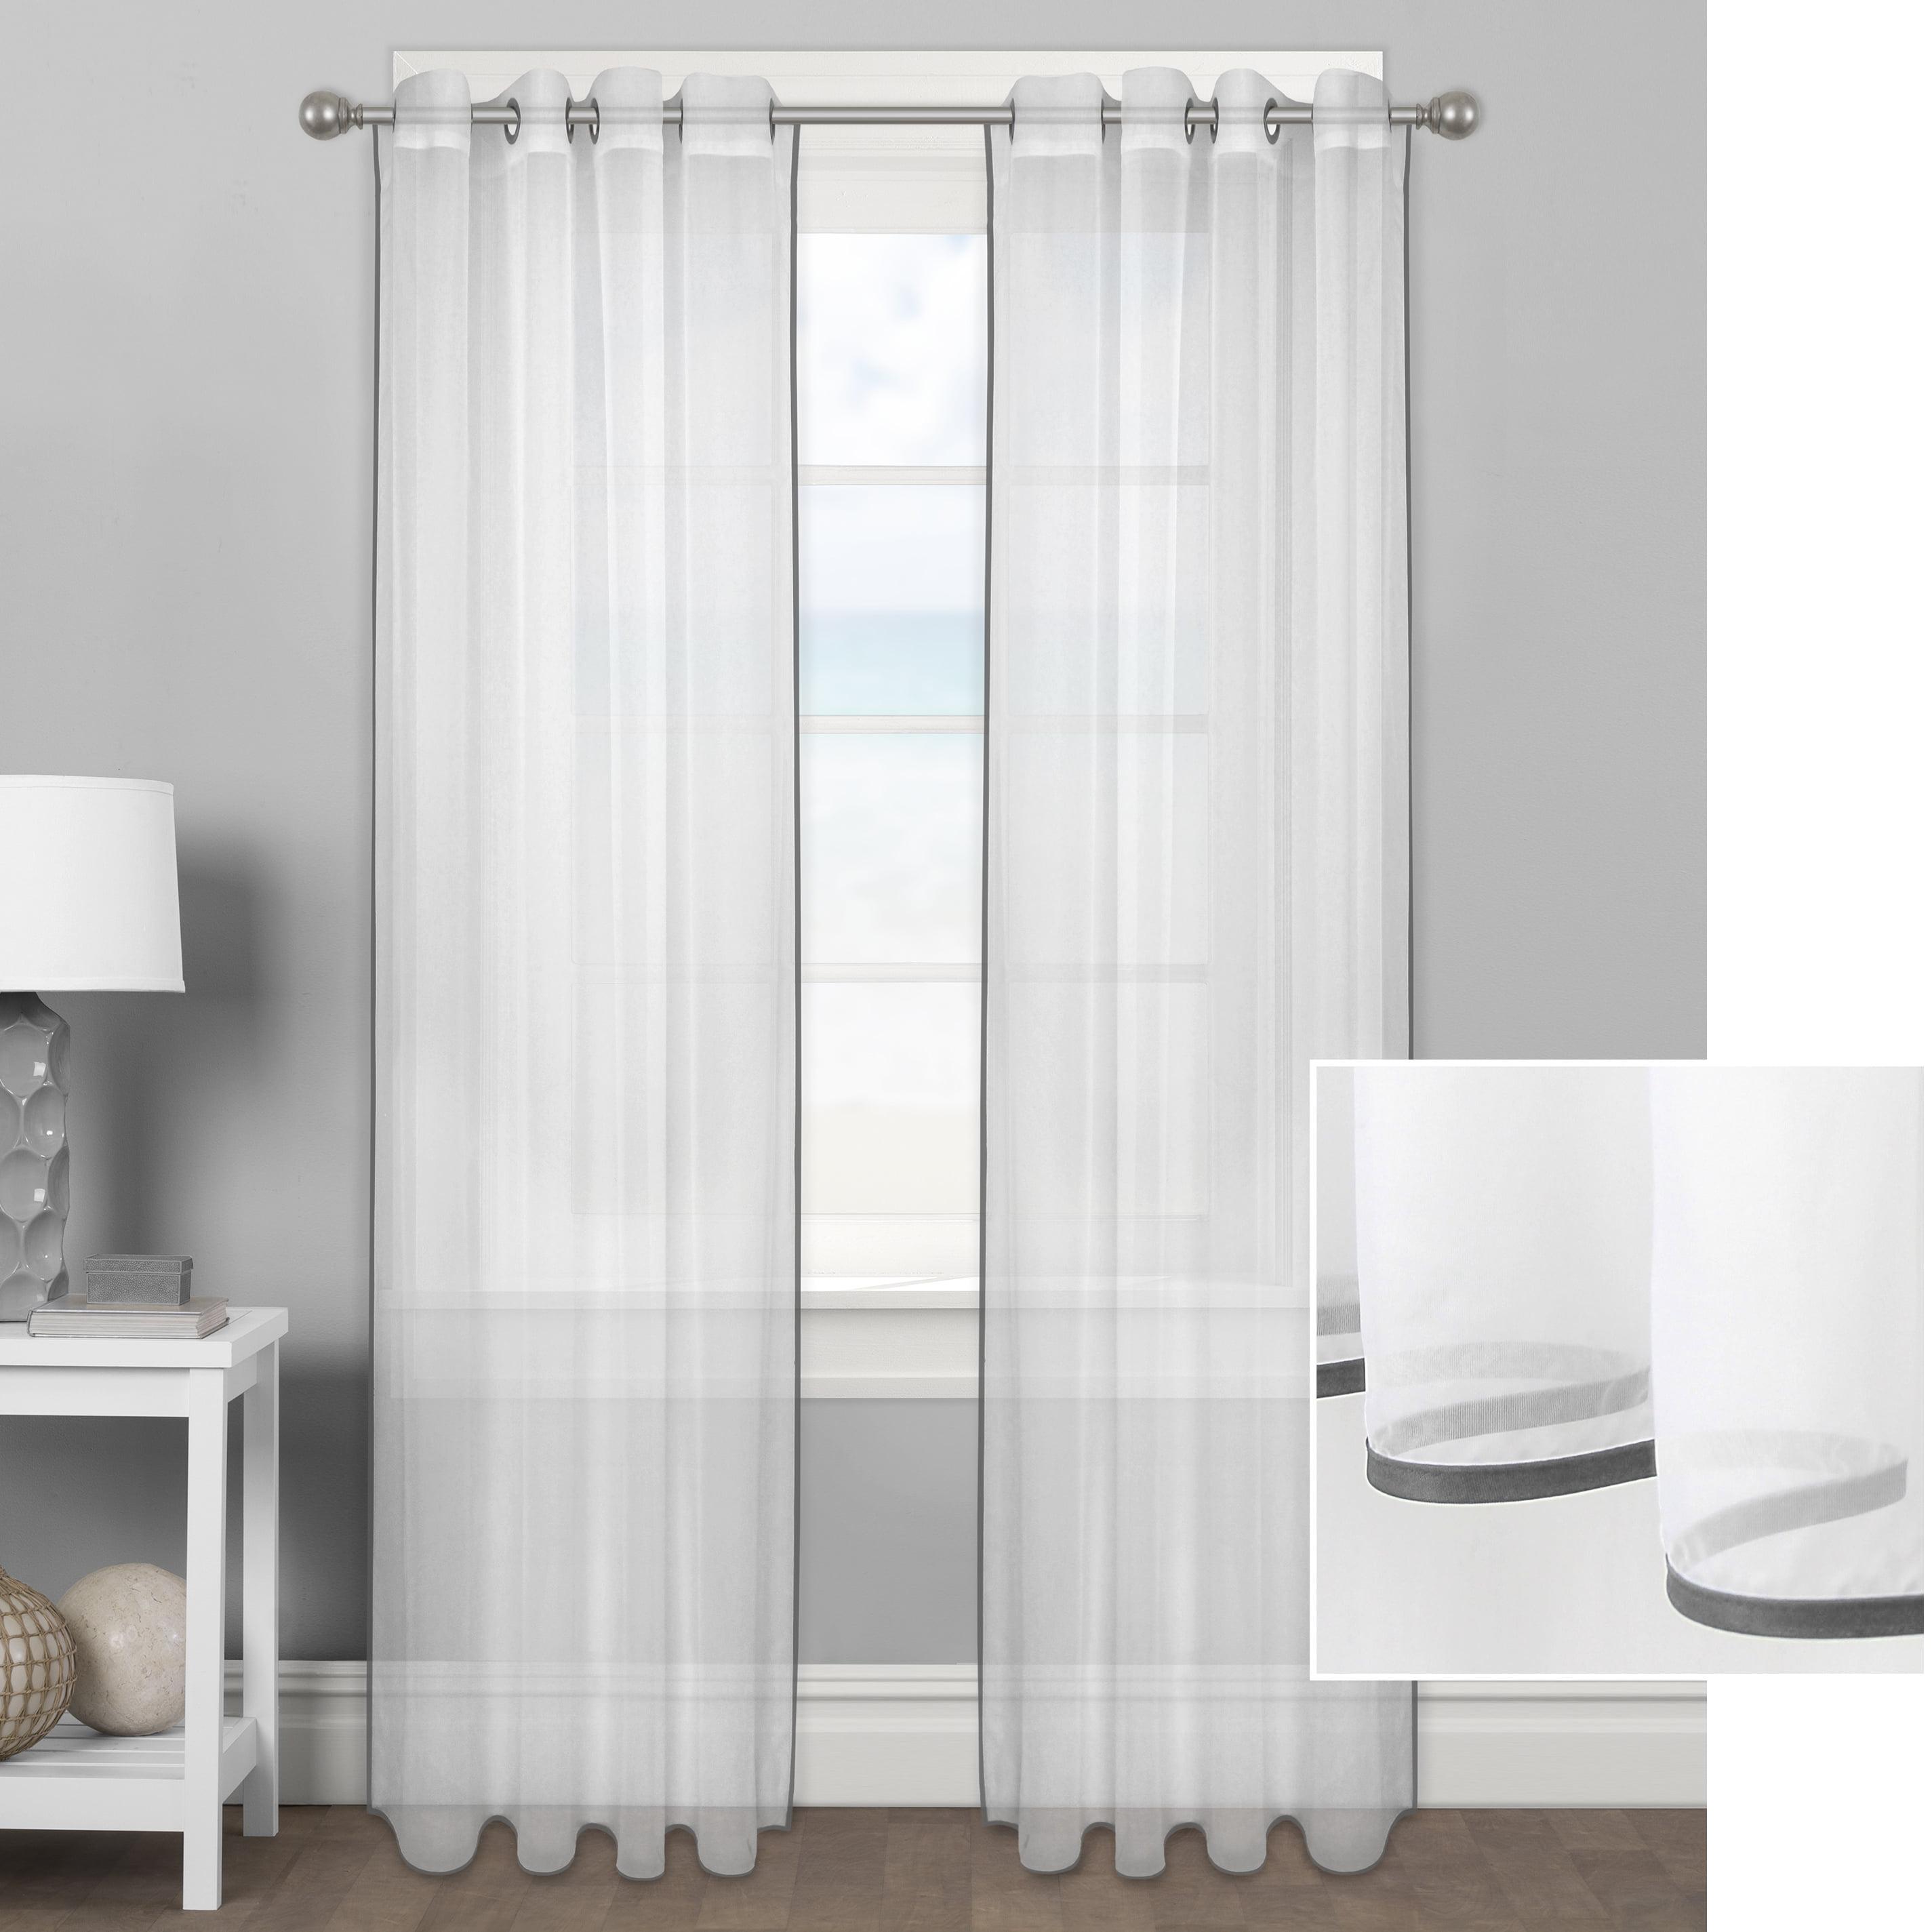 Better Homes & Gardens Ribbon Border Window Curtain Panel